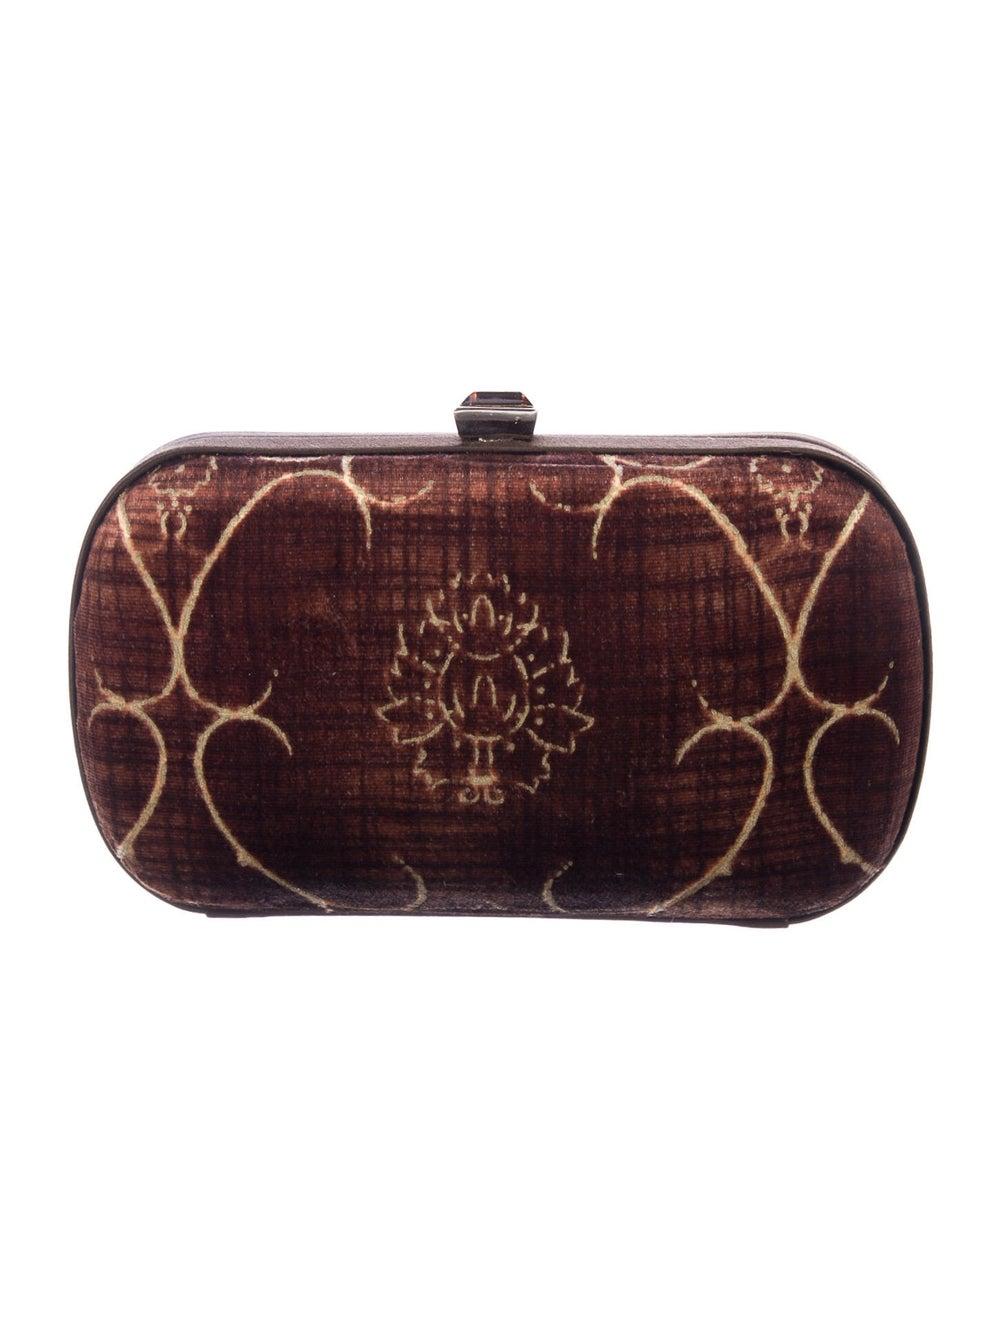 Bottega Veneta Vintage Velvet Box Clutch Brown - image 4